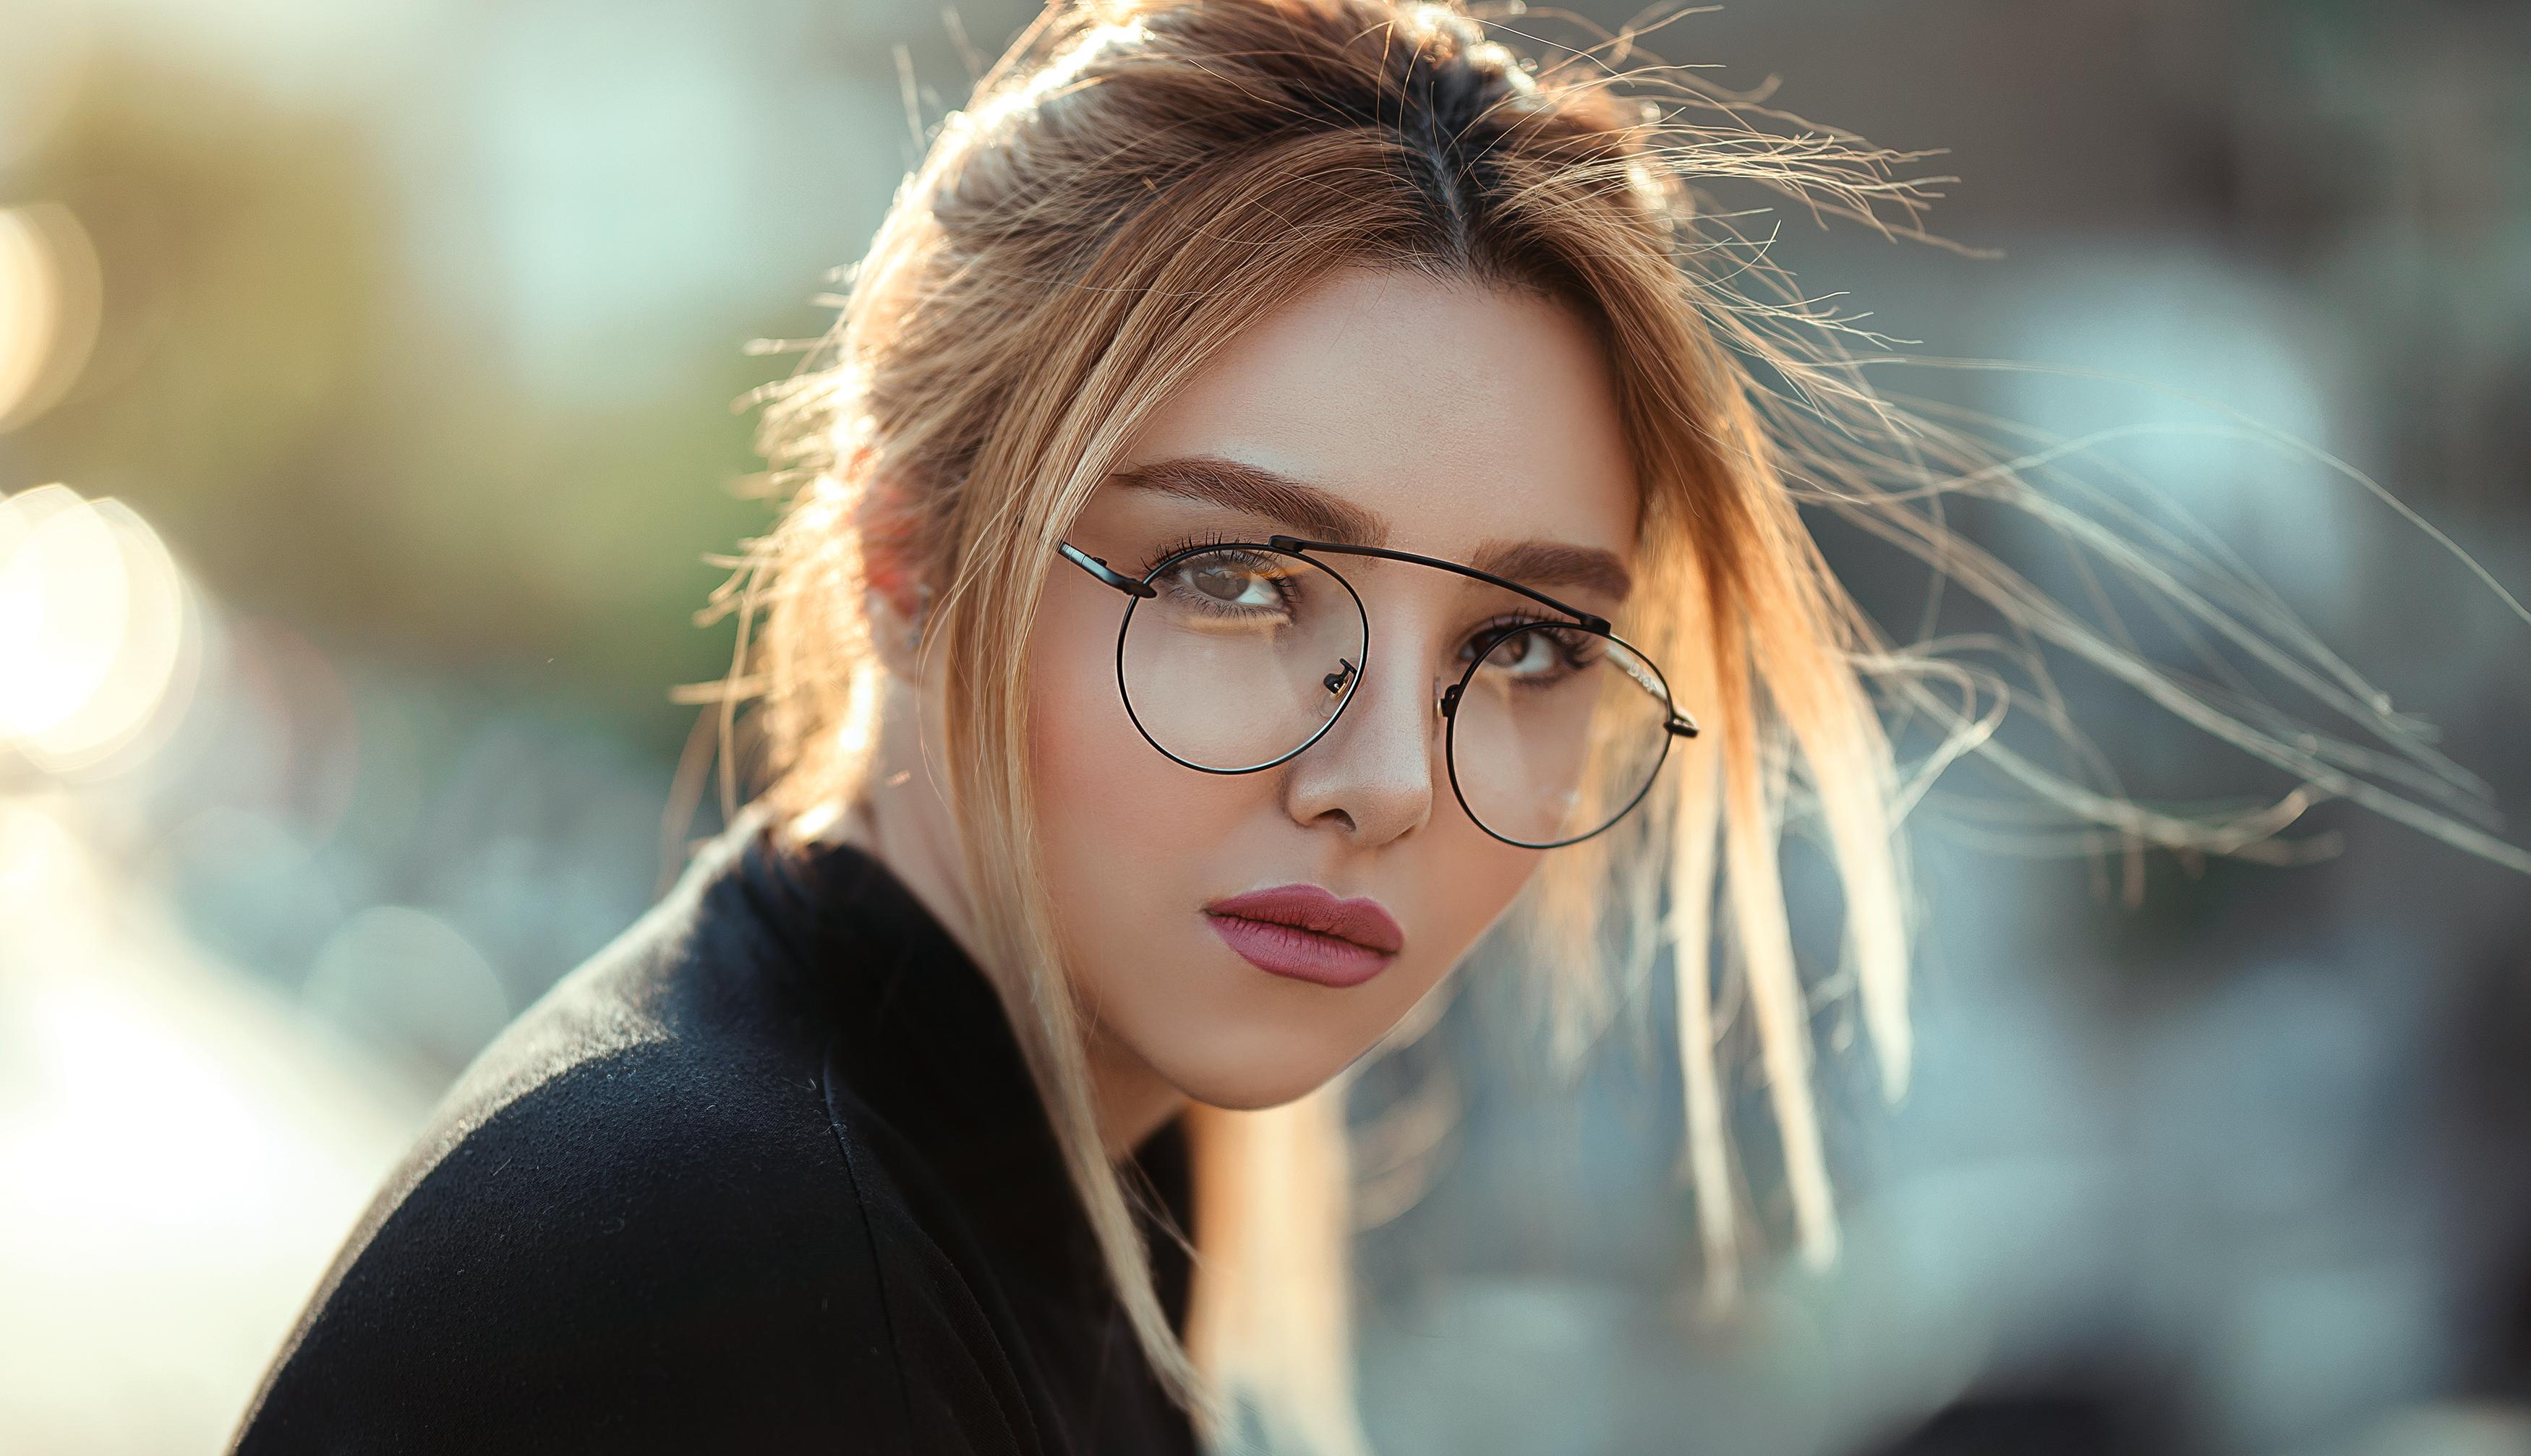 Woman in Black-framed Eyeglasses